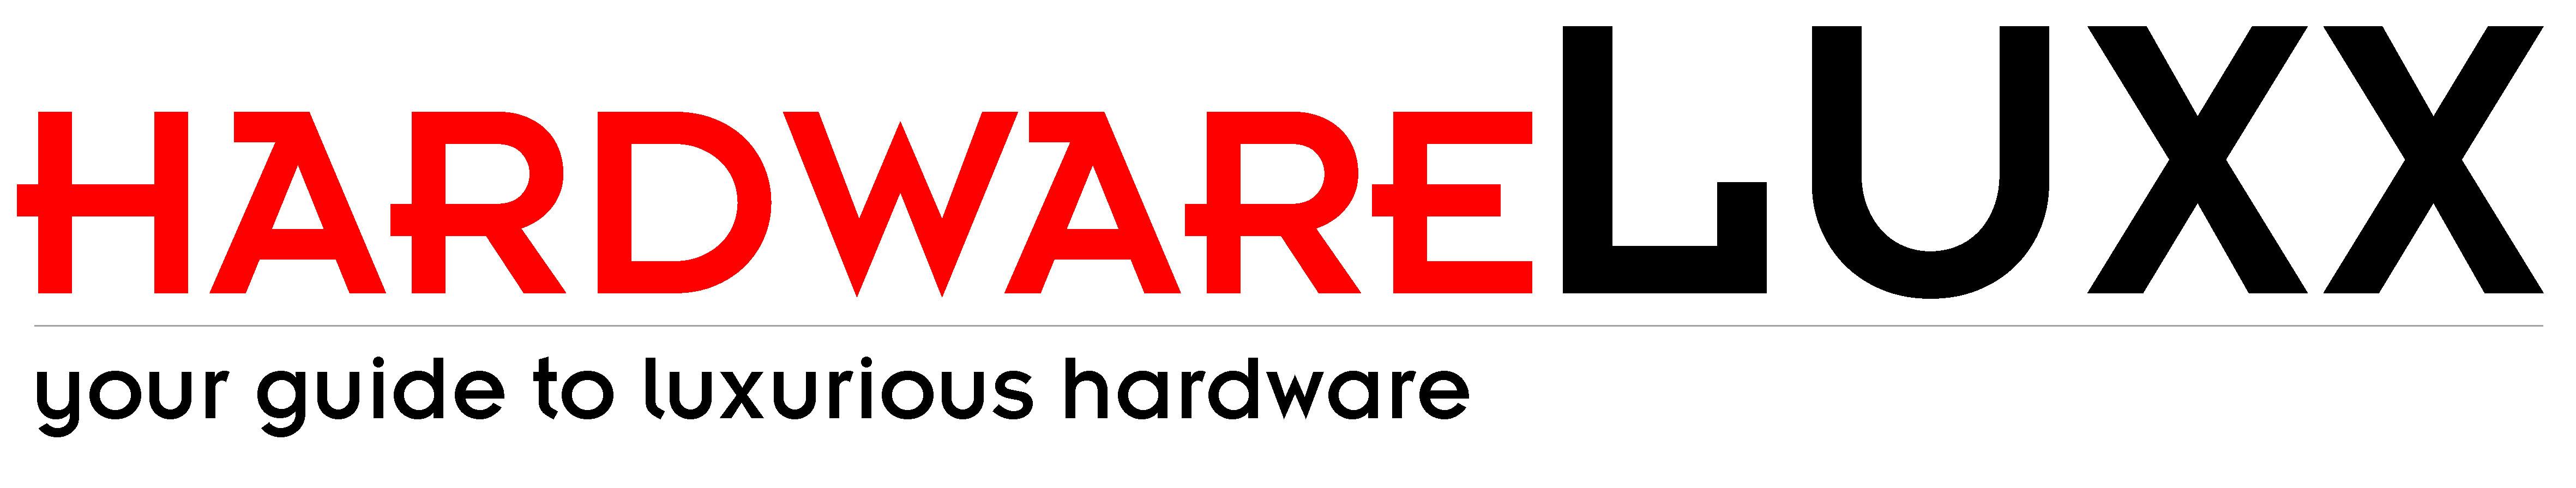 Hardwareluxx - инфопартнер «RACE-2014»!